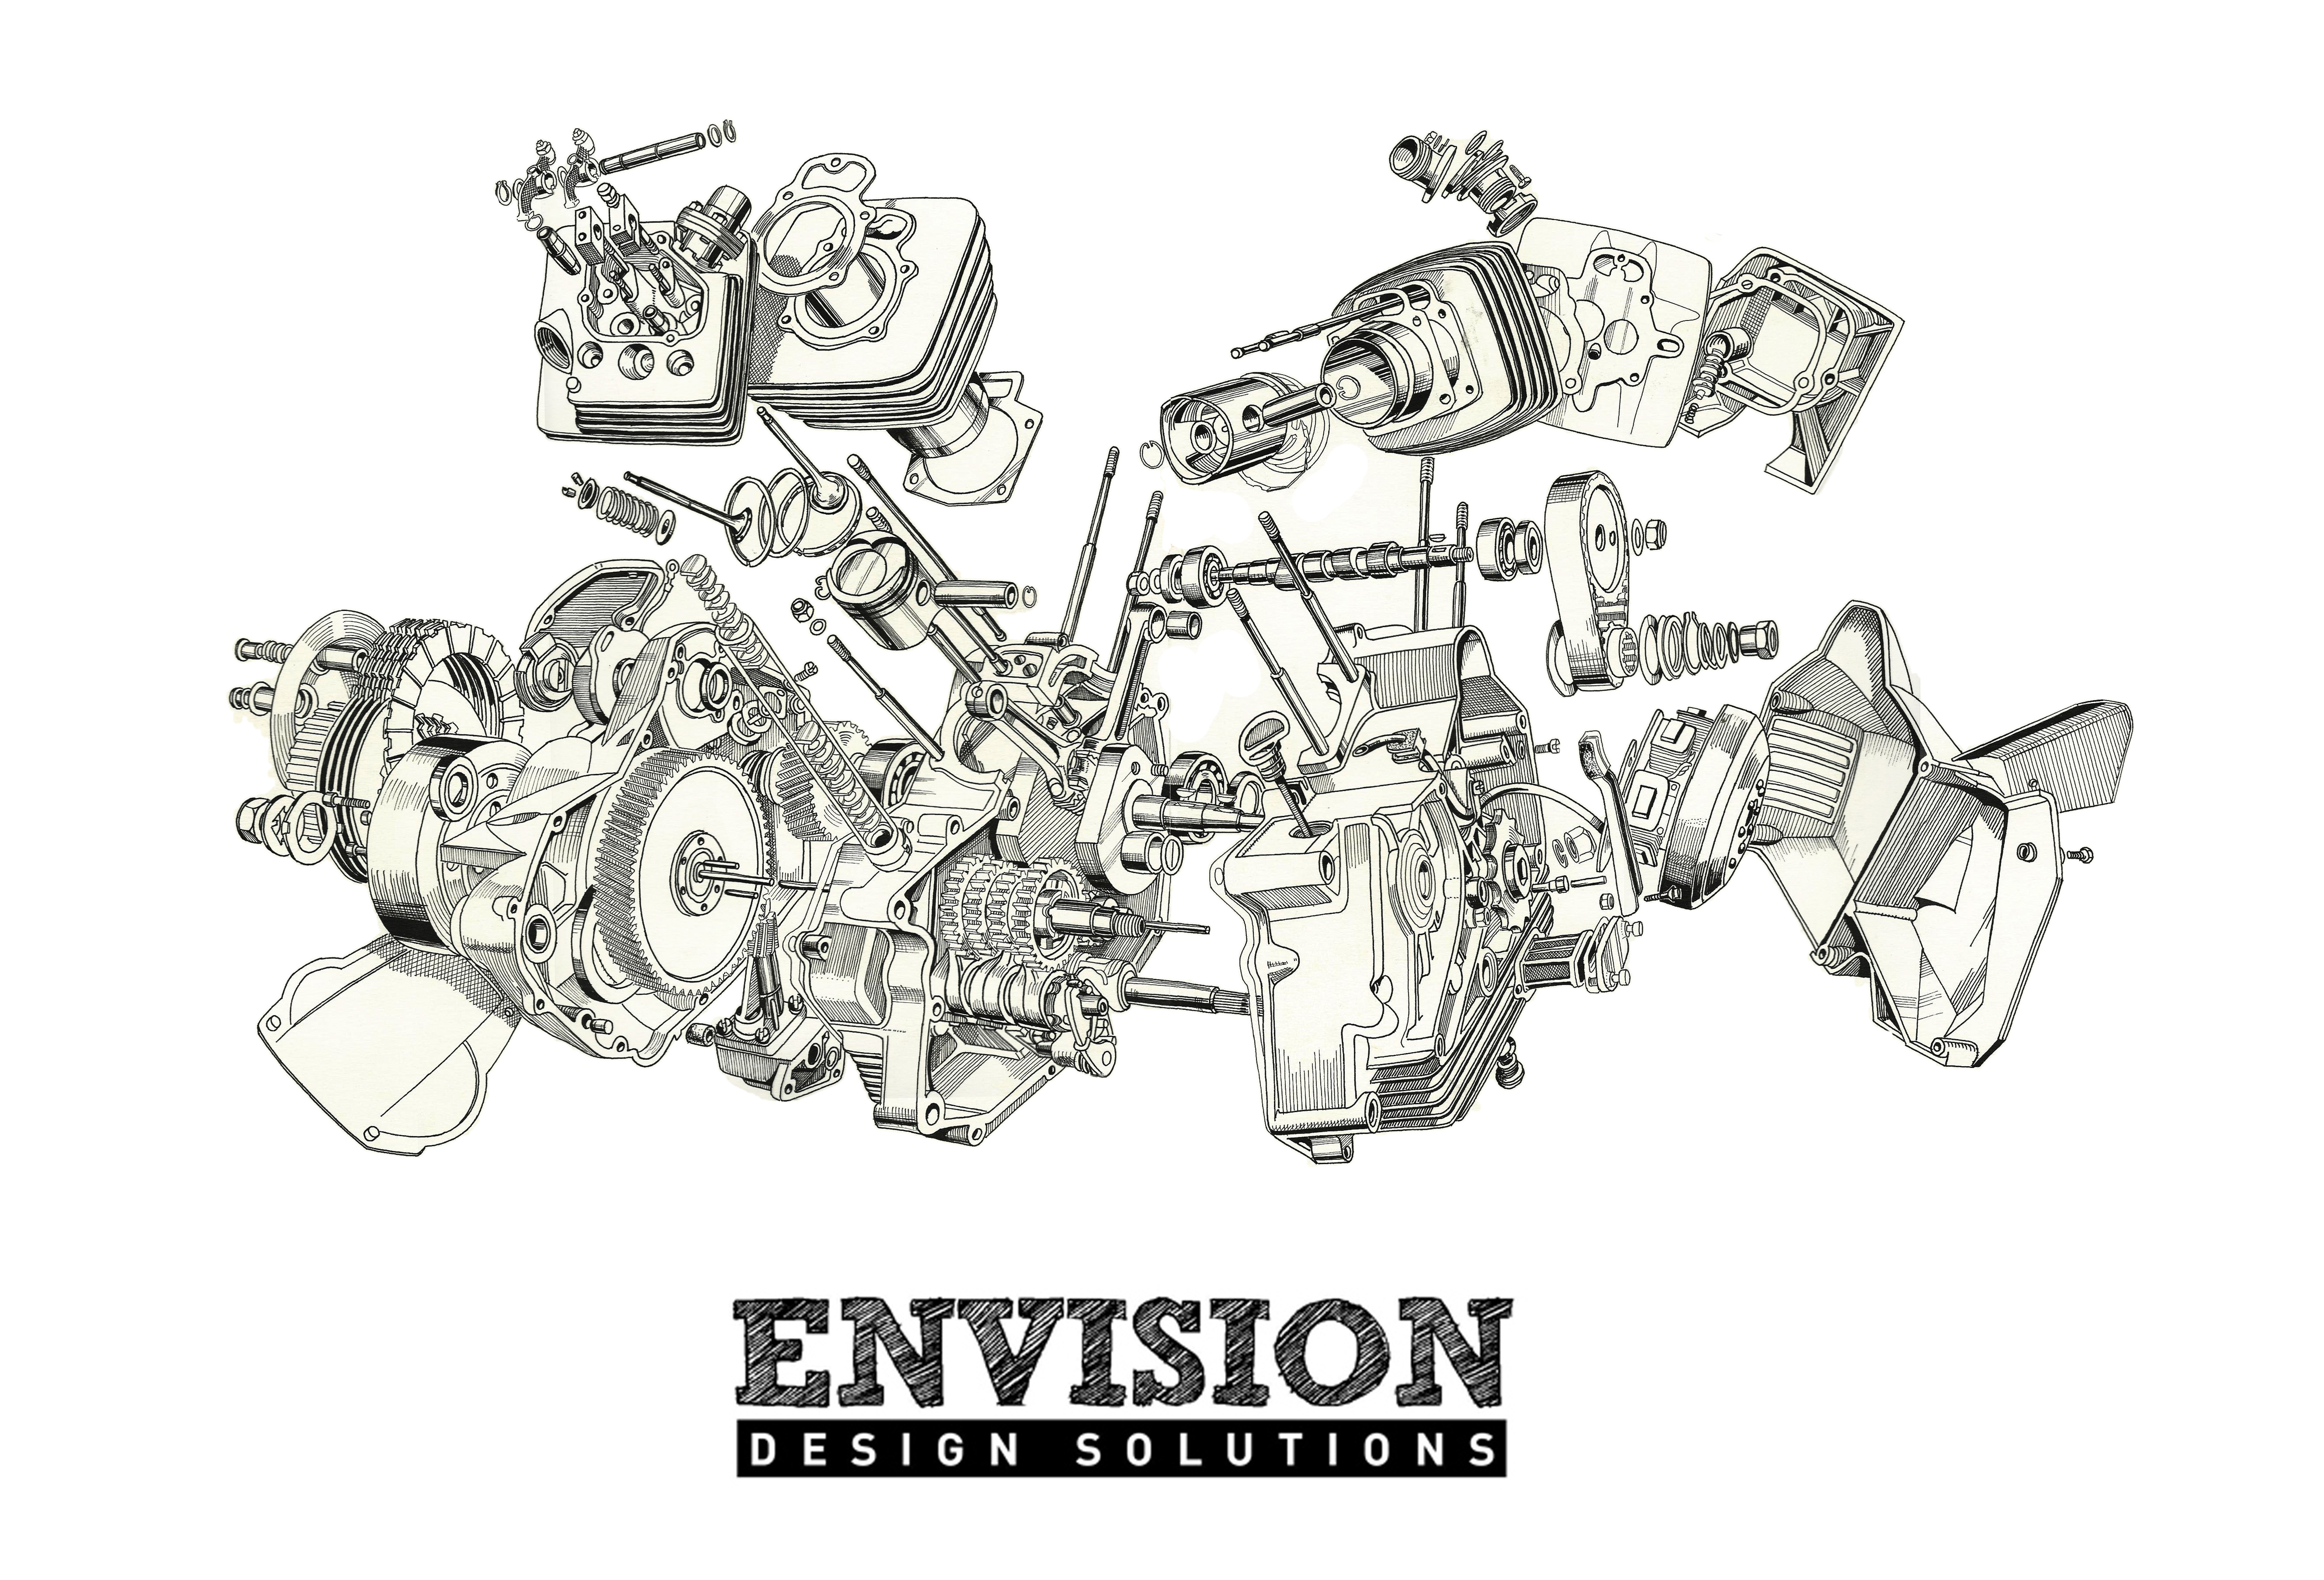 moto morini 350cc engine